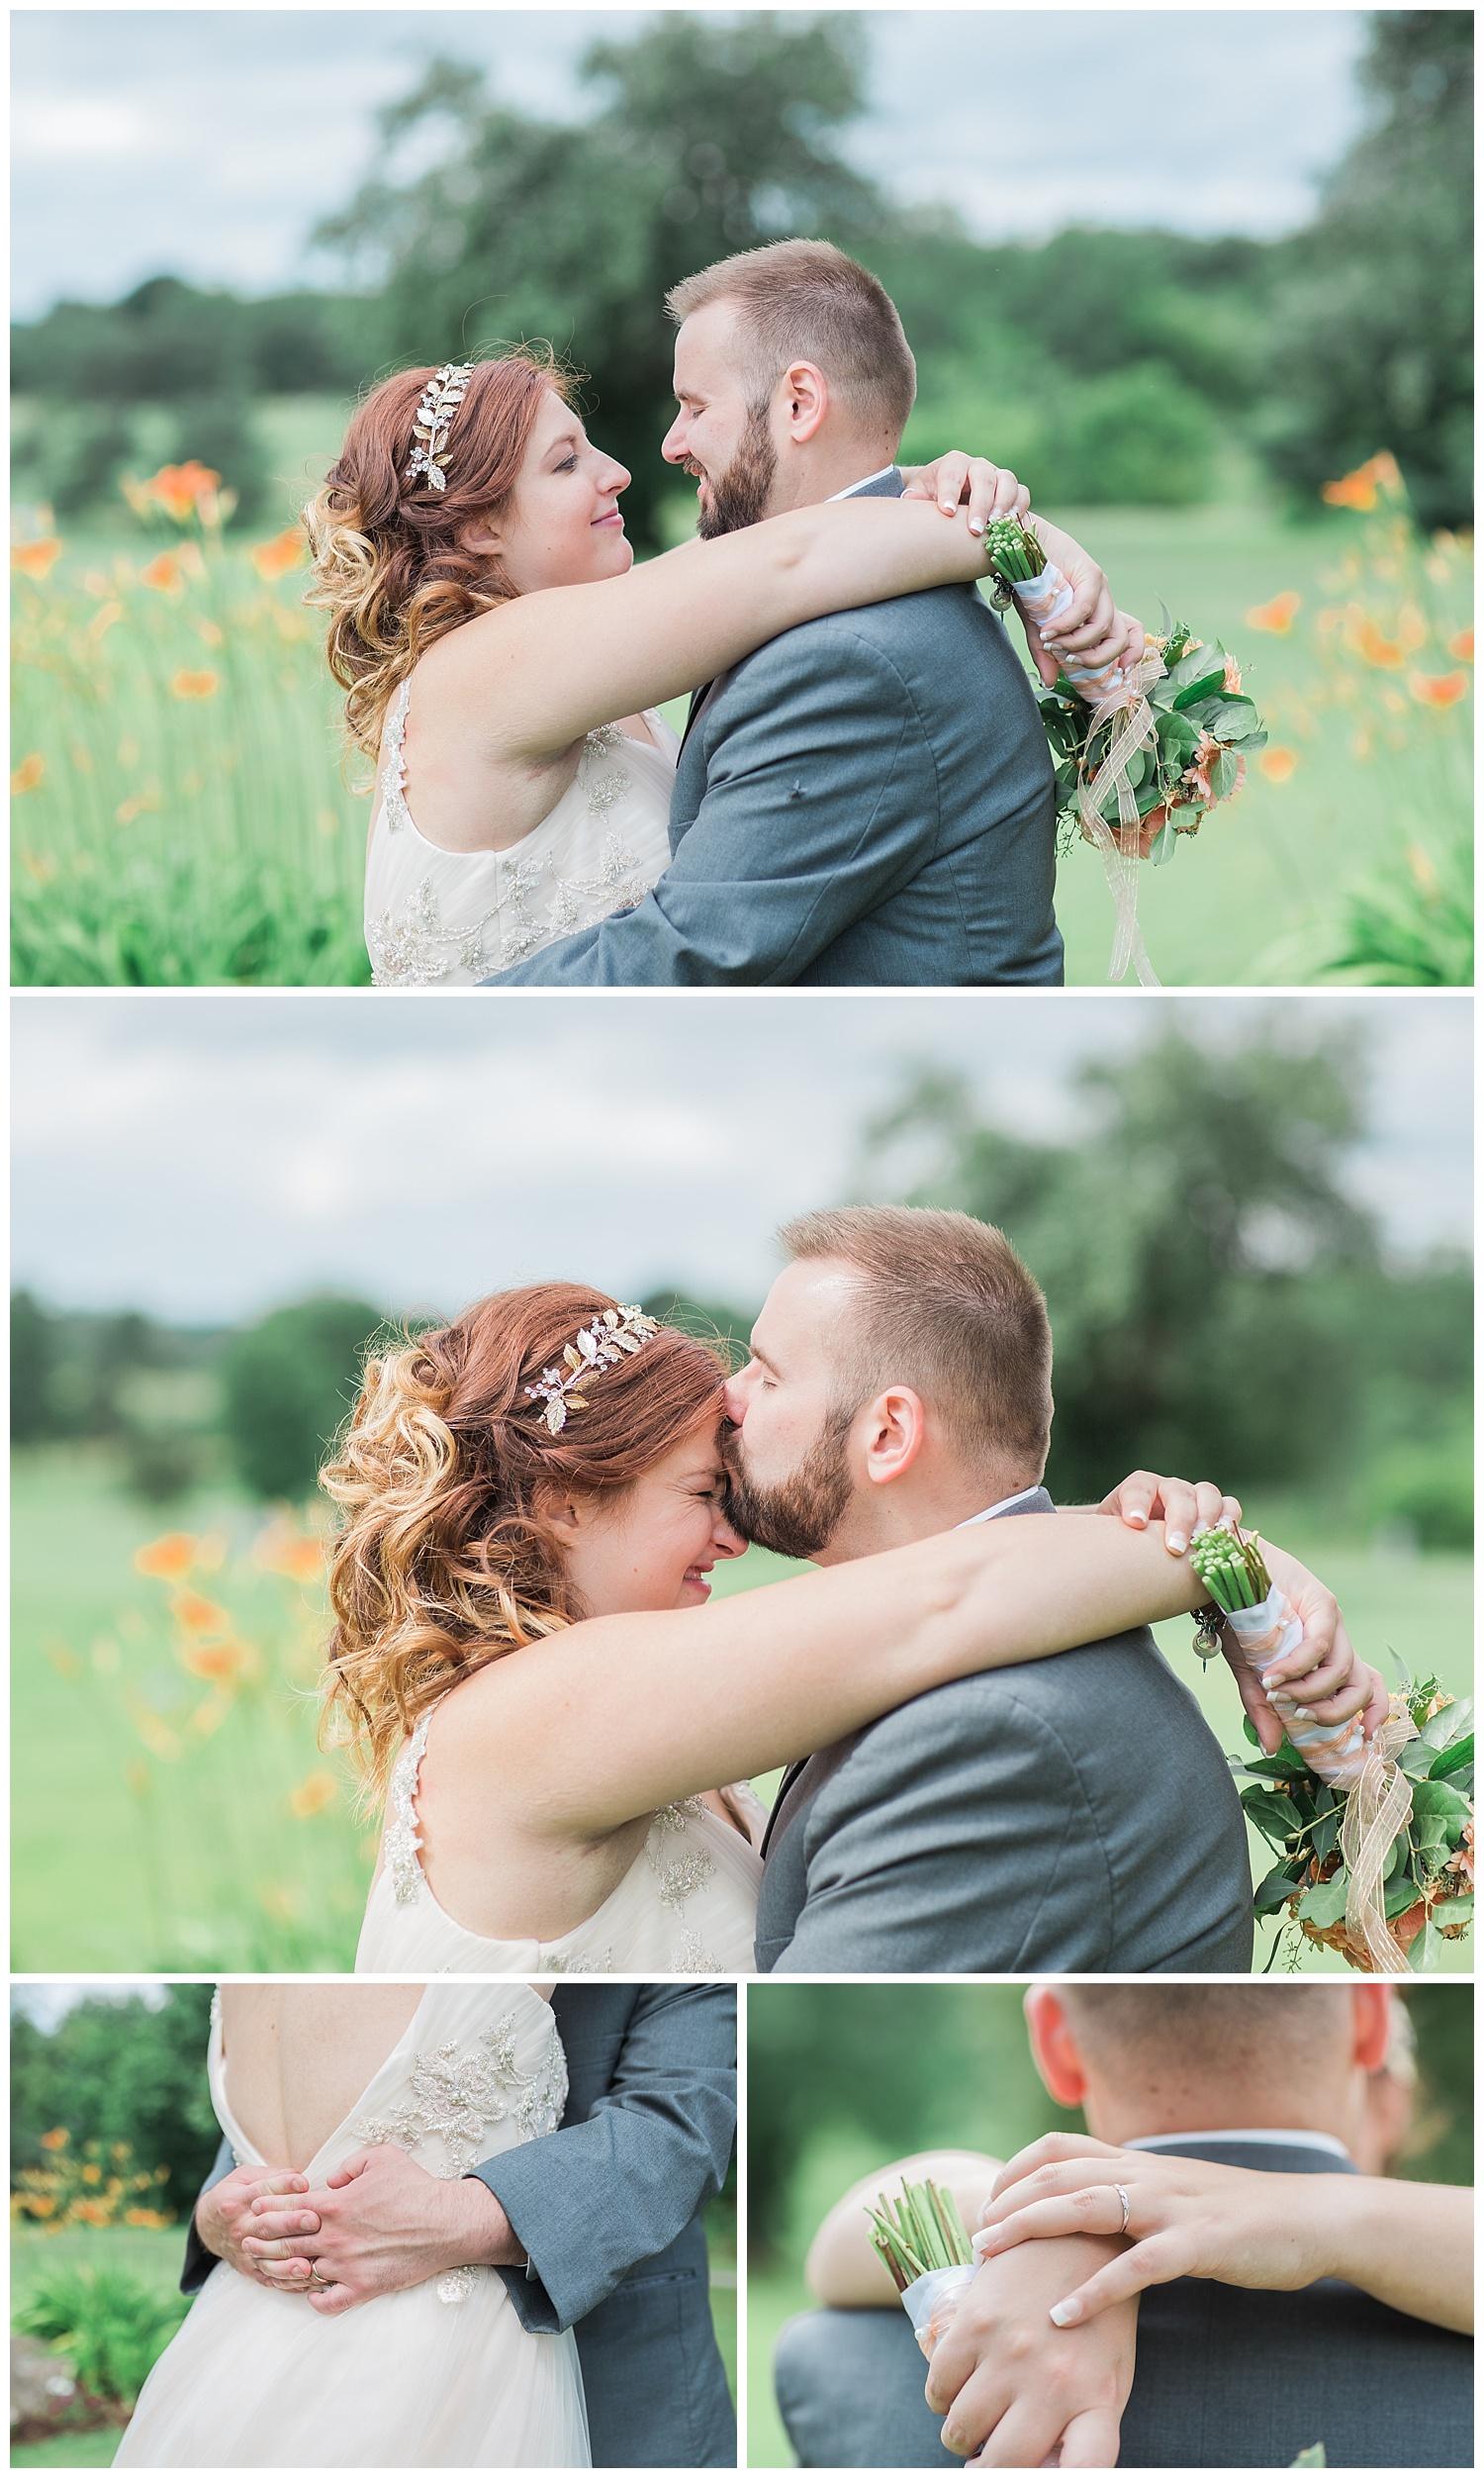 Brian and Molly Wed in Conesus NY - Lass & Beau-711_Buffalo wedding photography.jpg